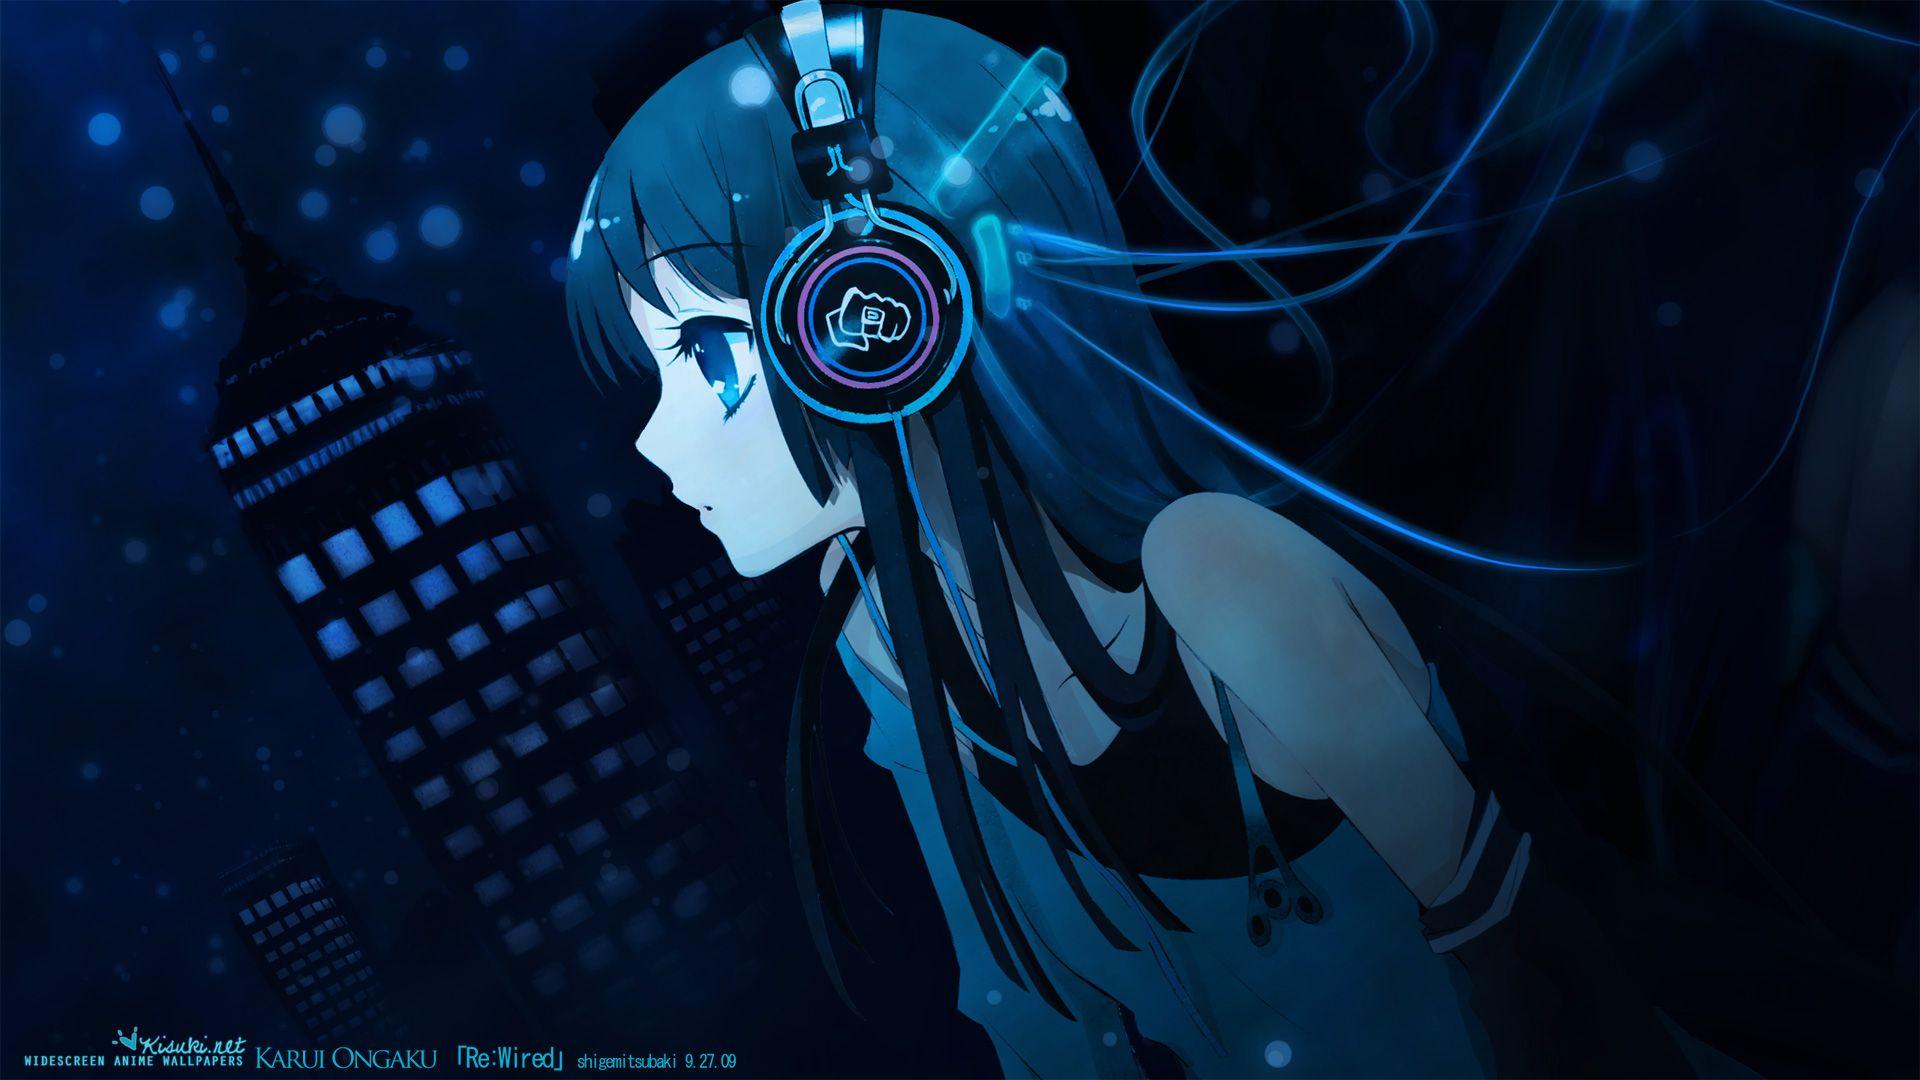 Download Wallpaper Anime 4k Hd Art Wallpaper Cool Anime Wallpapers 1080p Anime Wallpaper Hd Anime Wallpapers